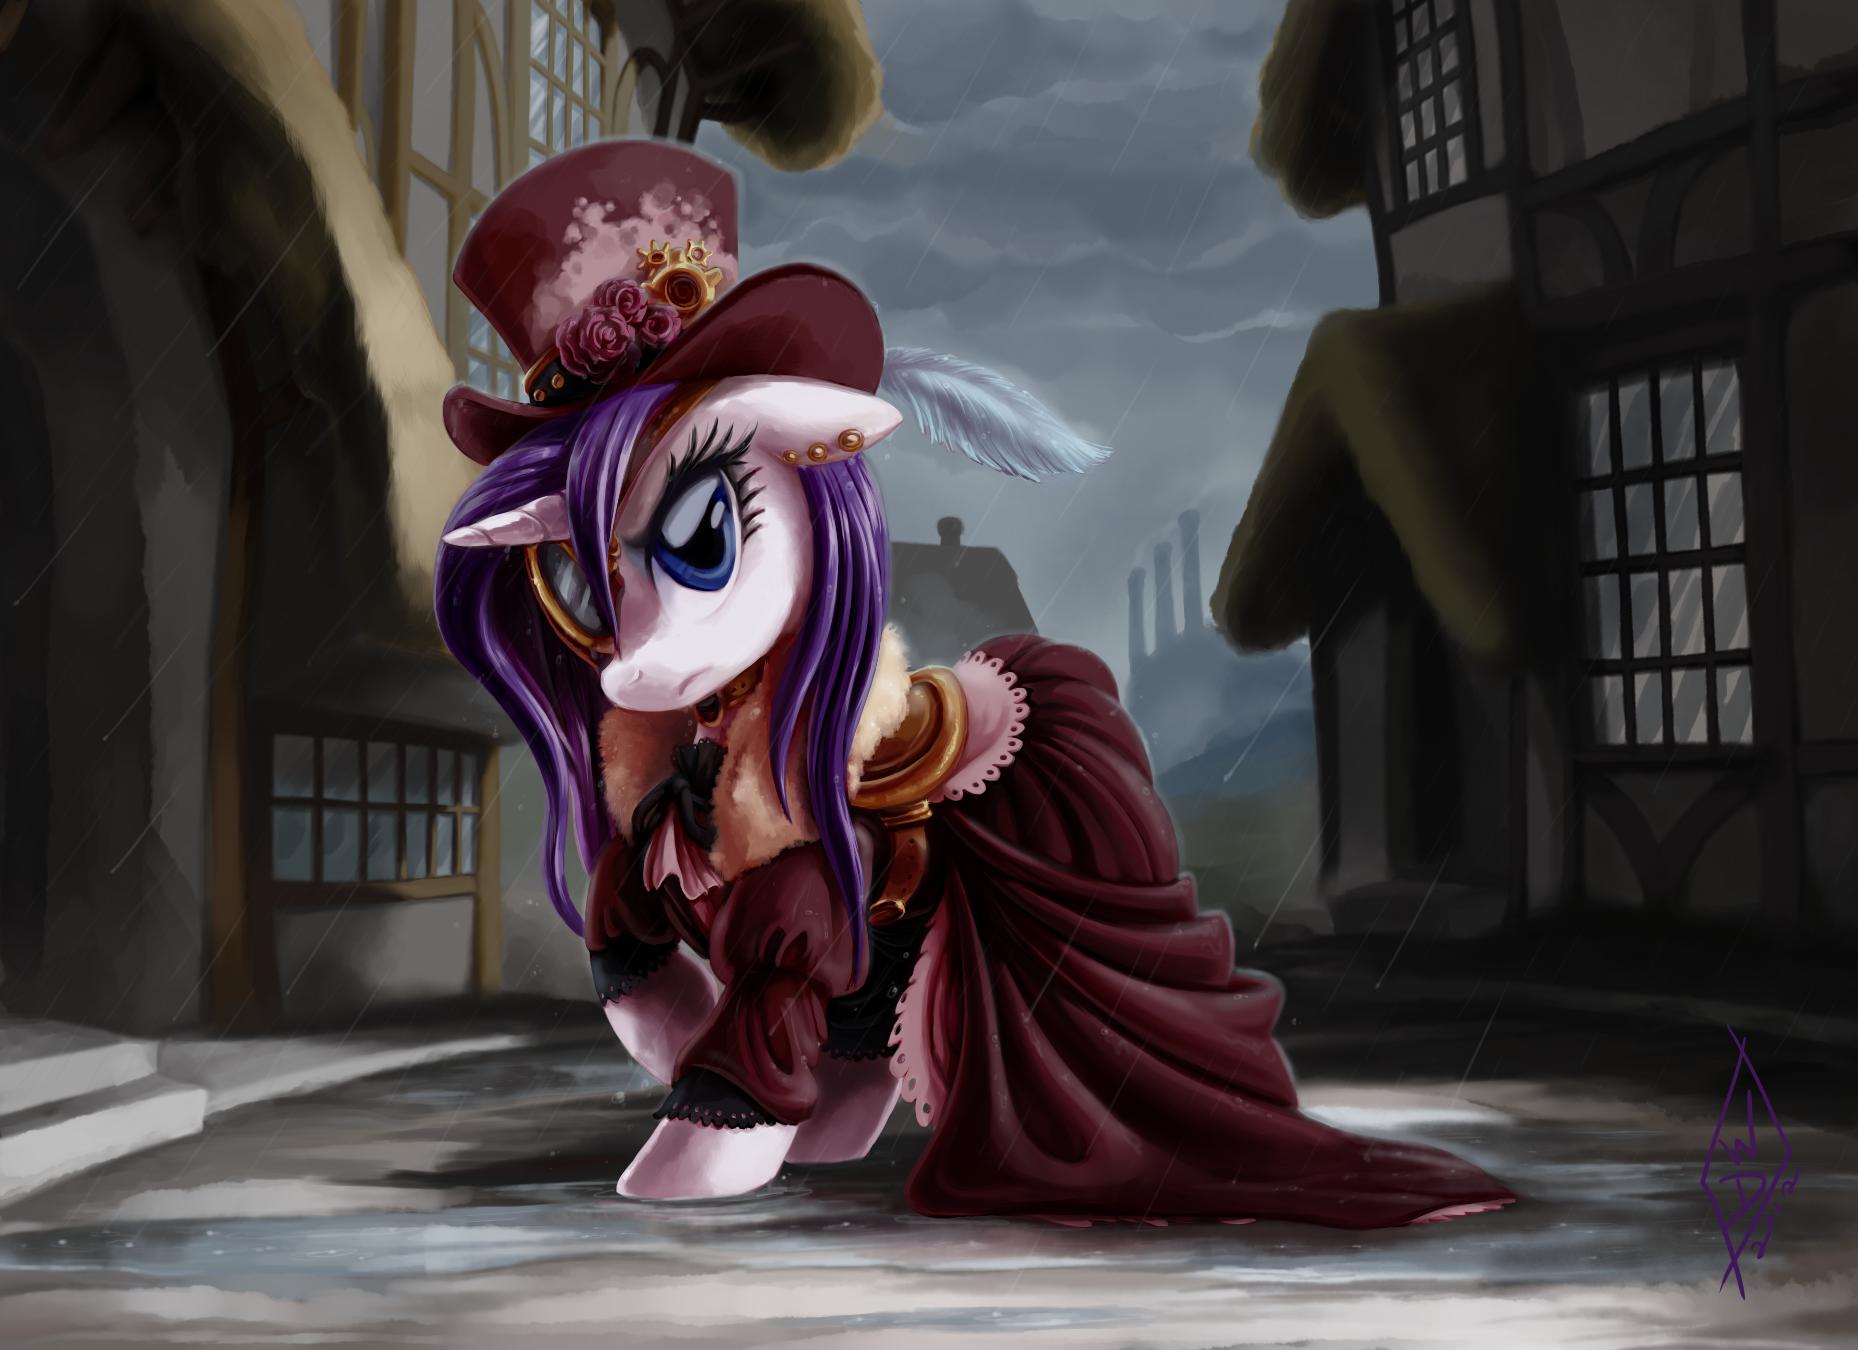 Commission: Steampunk Rarity by WhiteDiamondsLtd